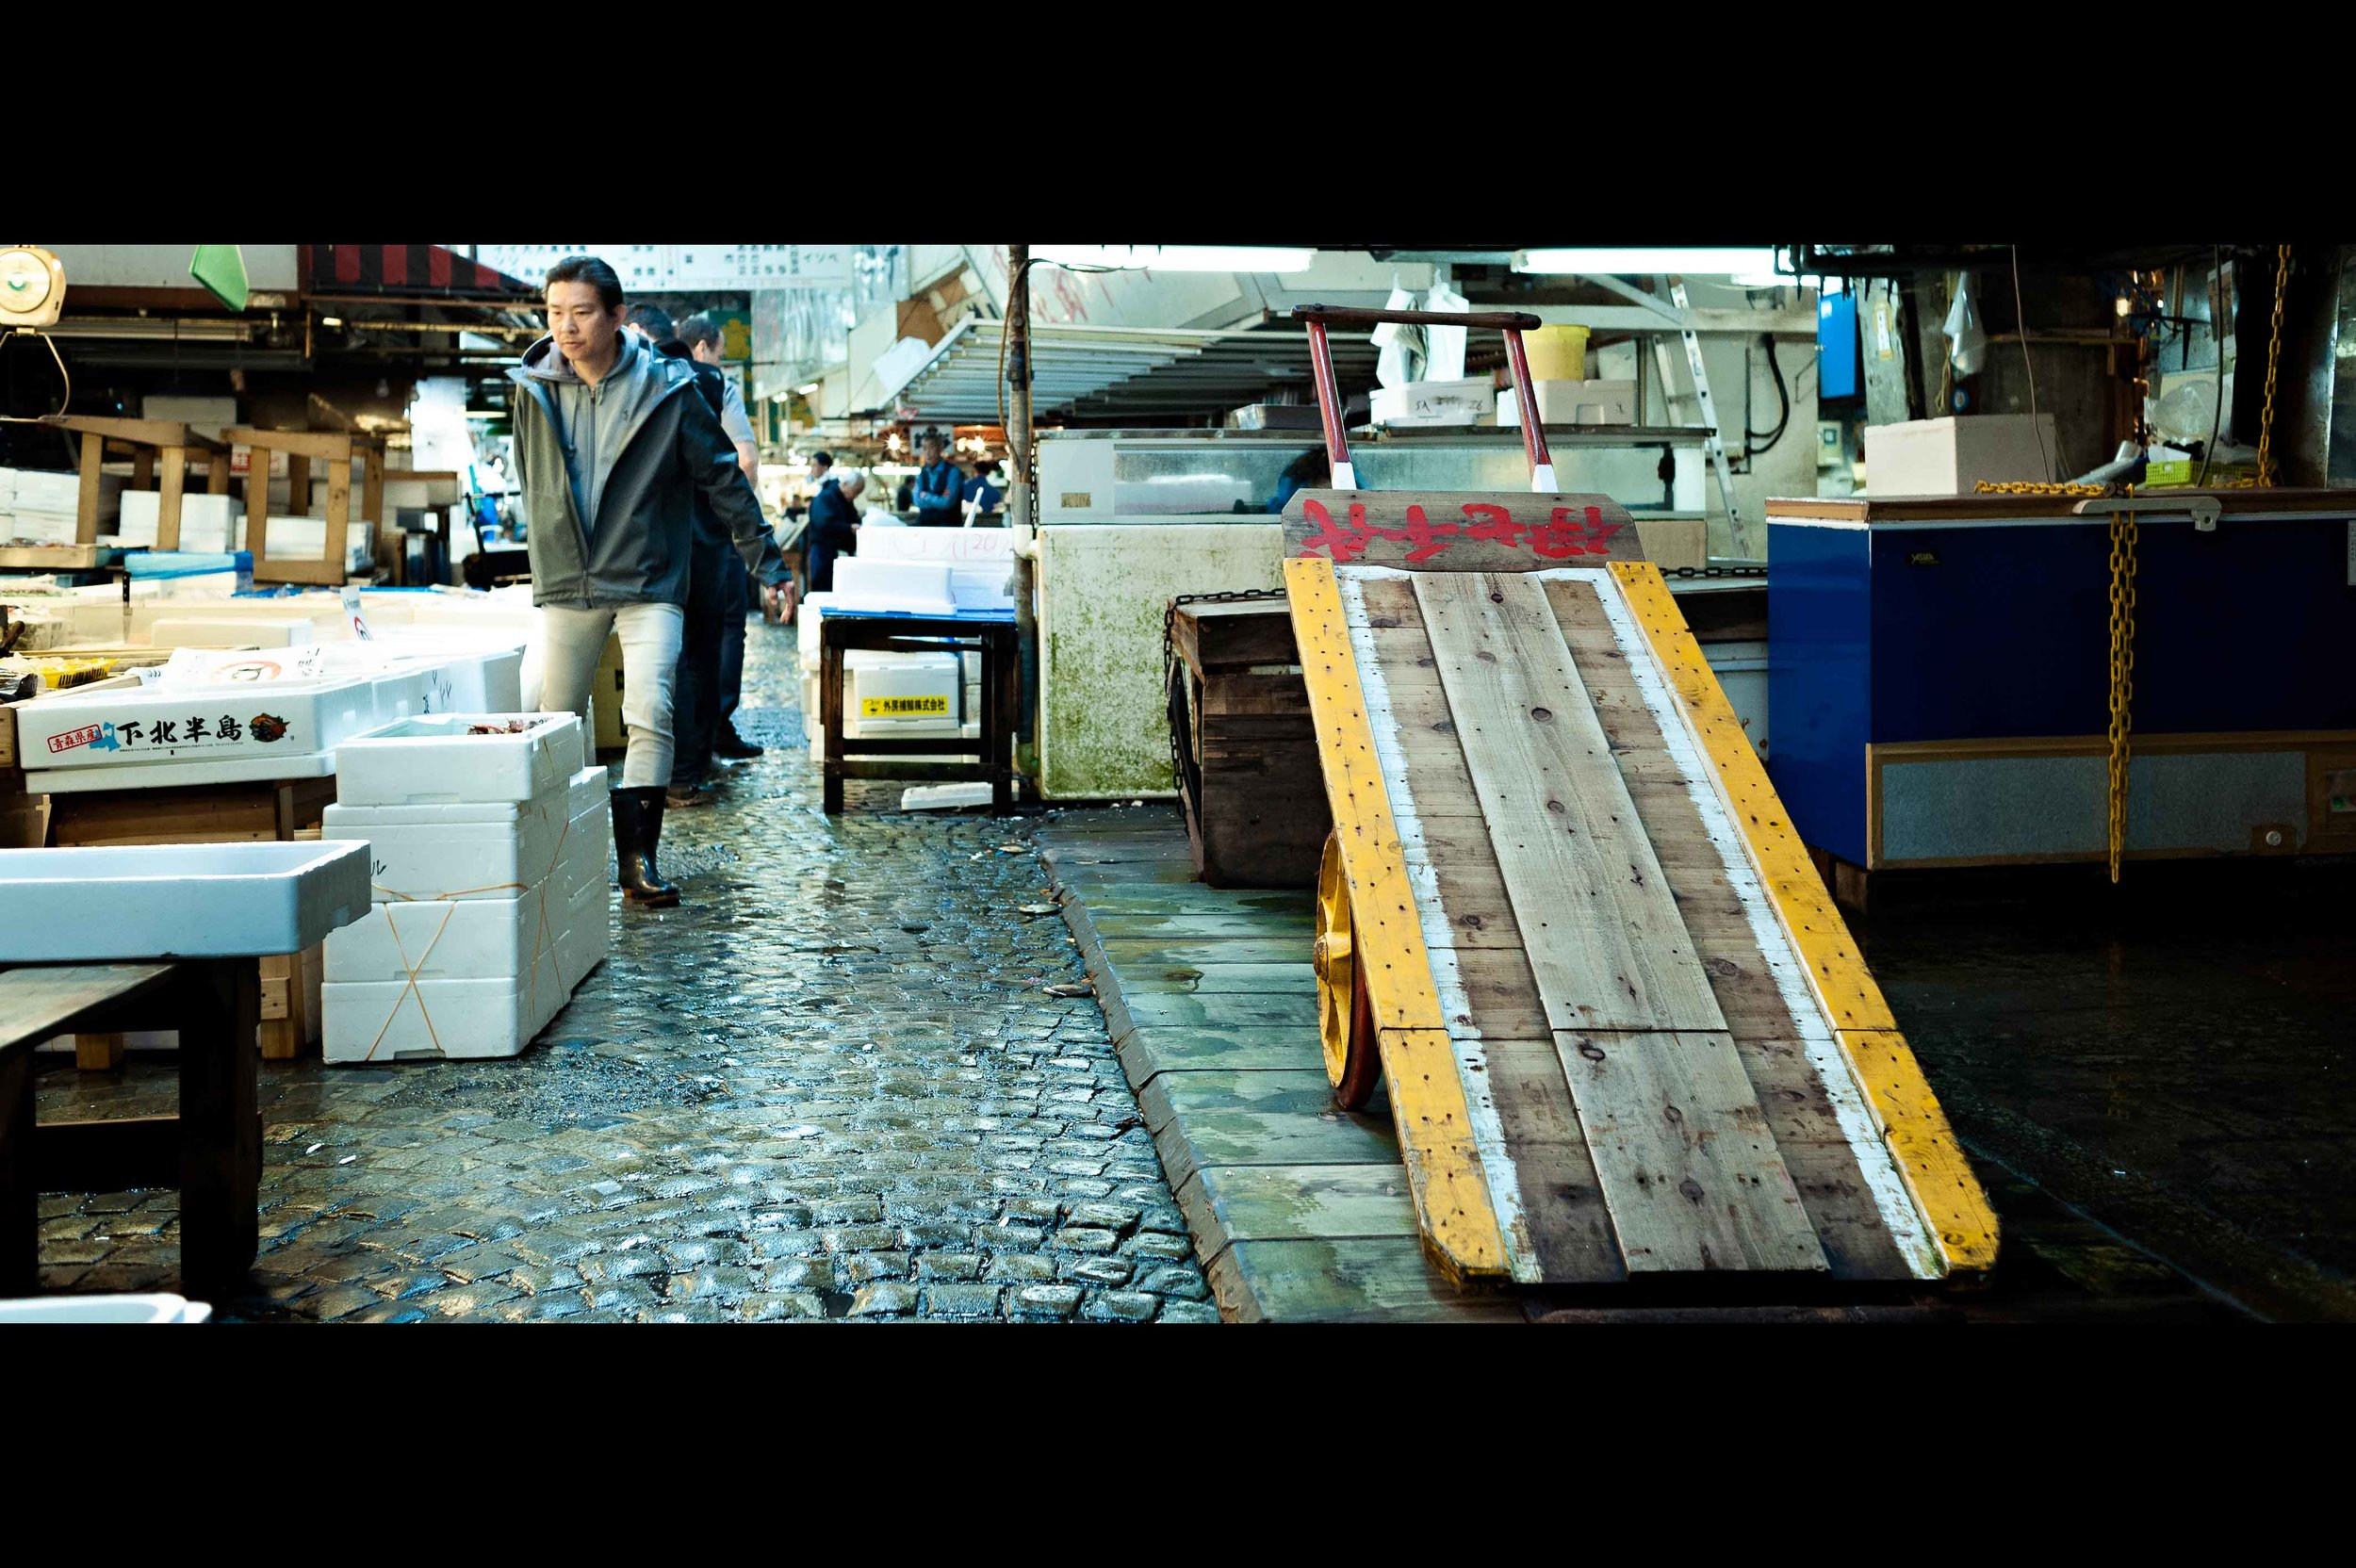 tsukiji-fish-market-wheel-cart.jpg